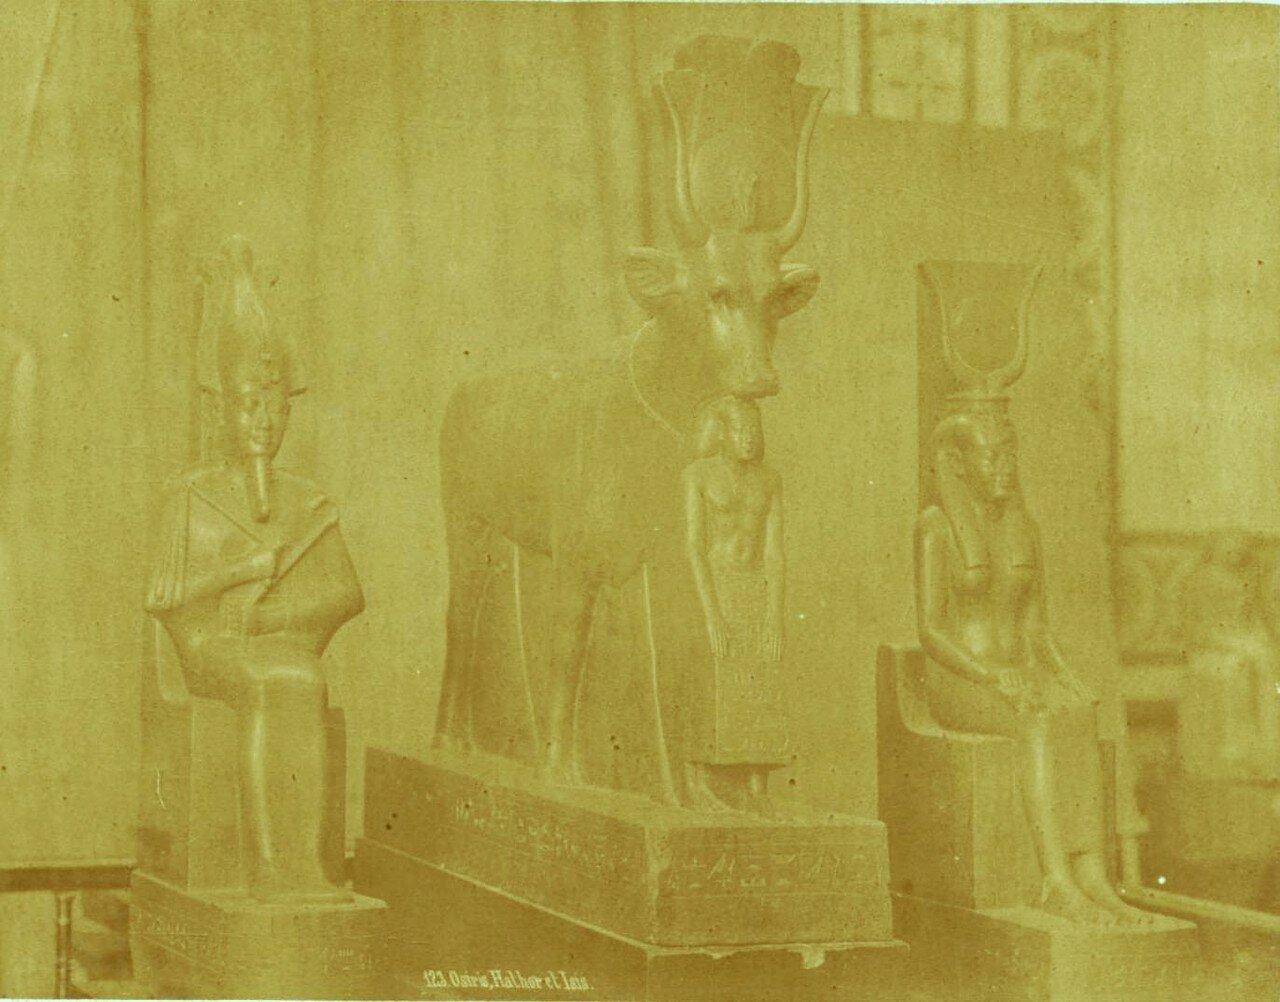 Осирис, Хатхор и Исида